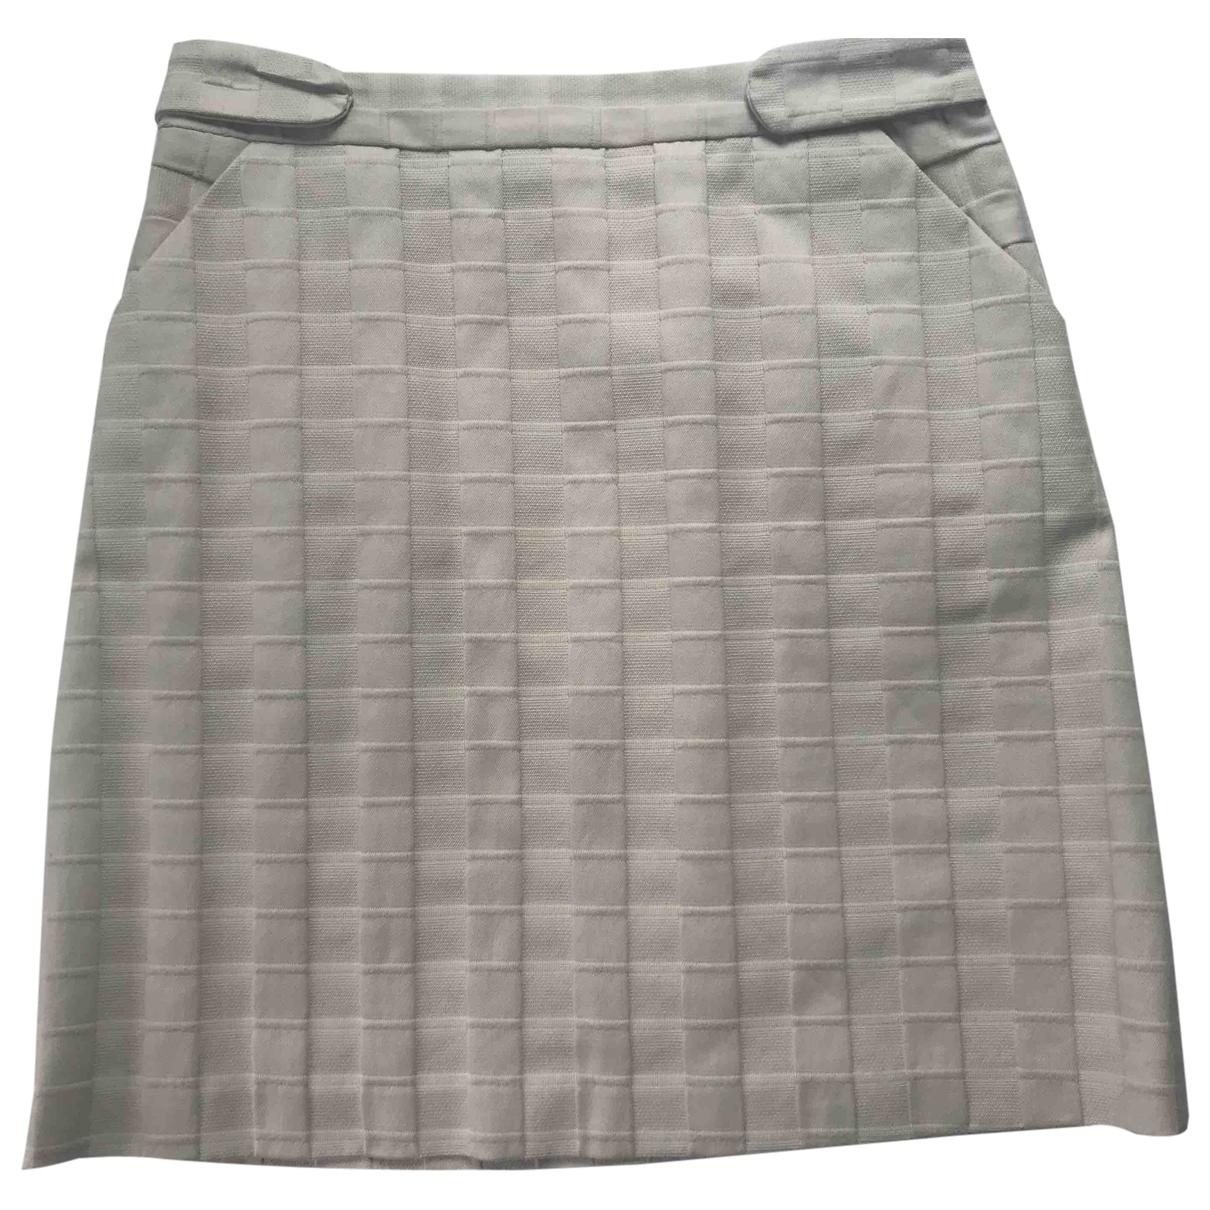 Milly \N Ecru Cotton skirt for Women 42 IT